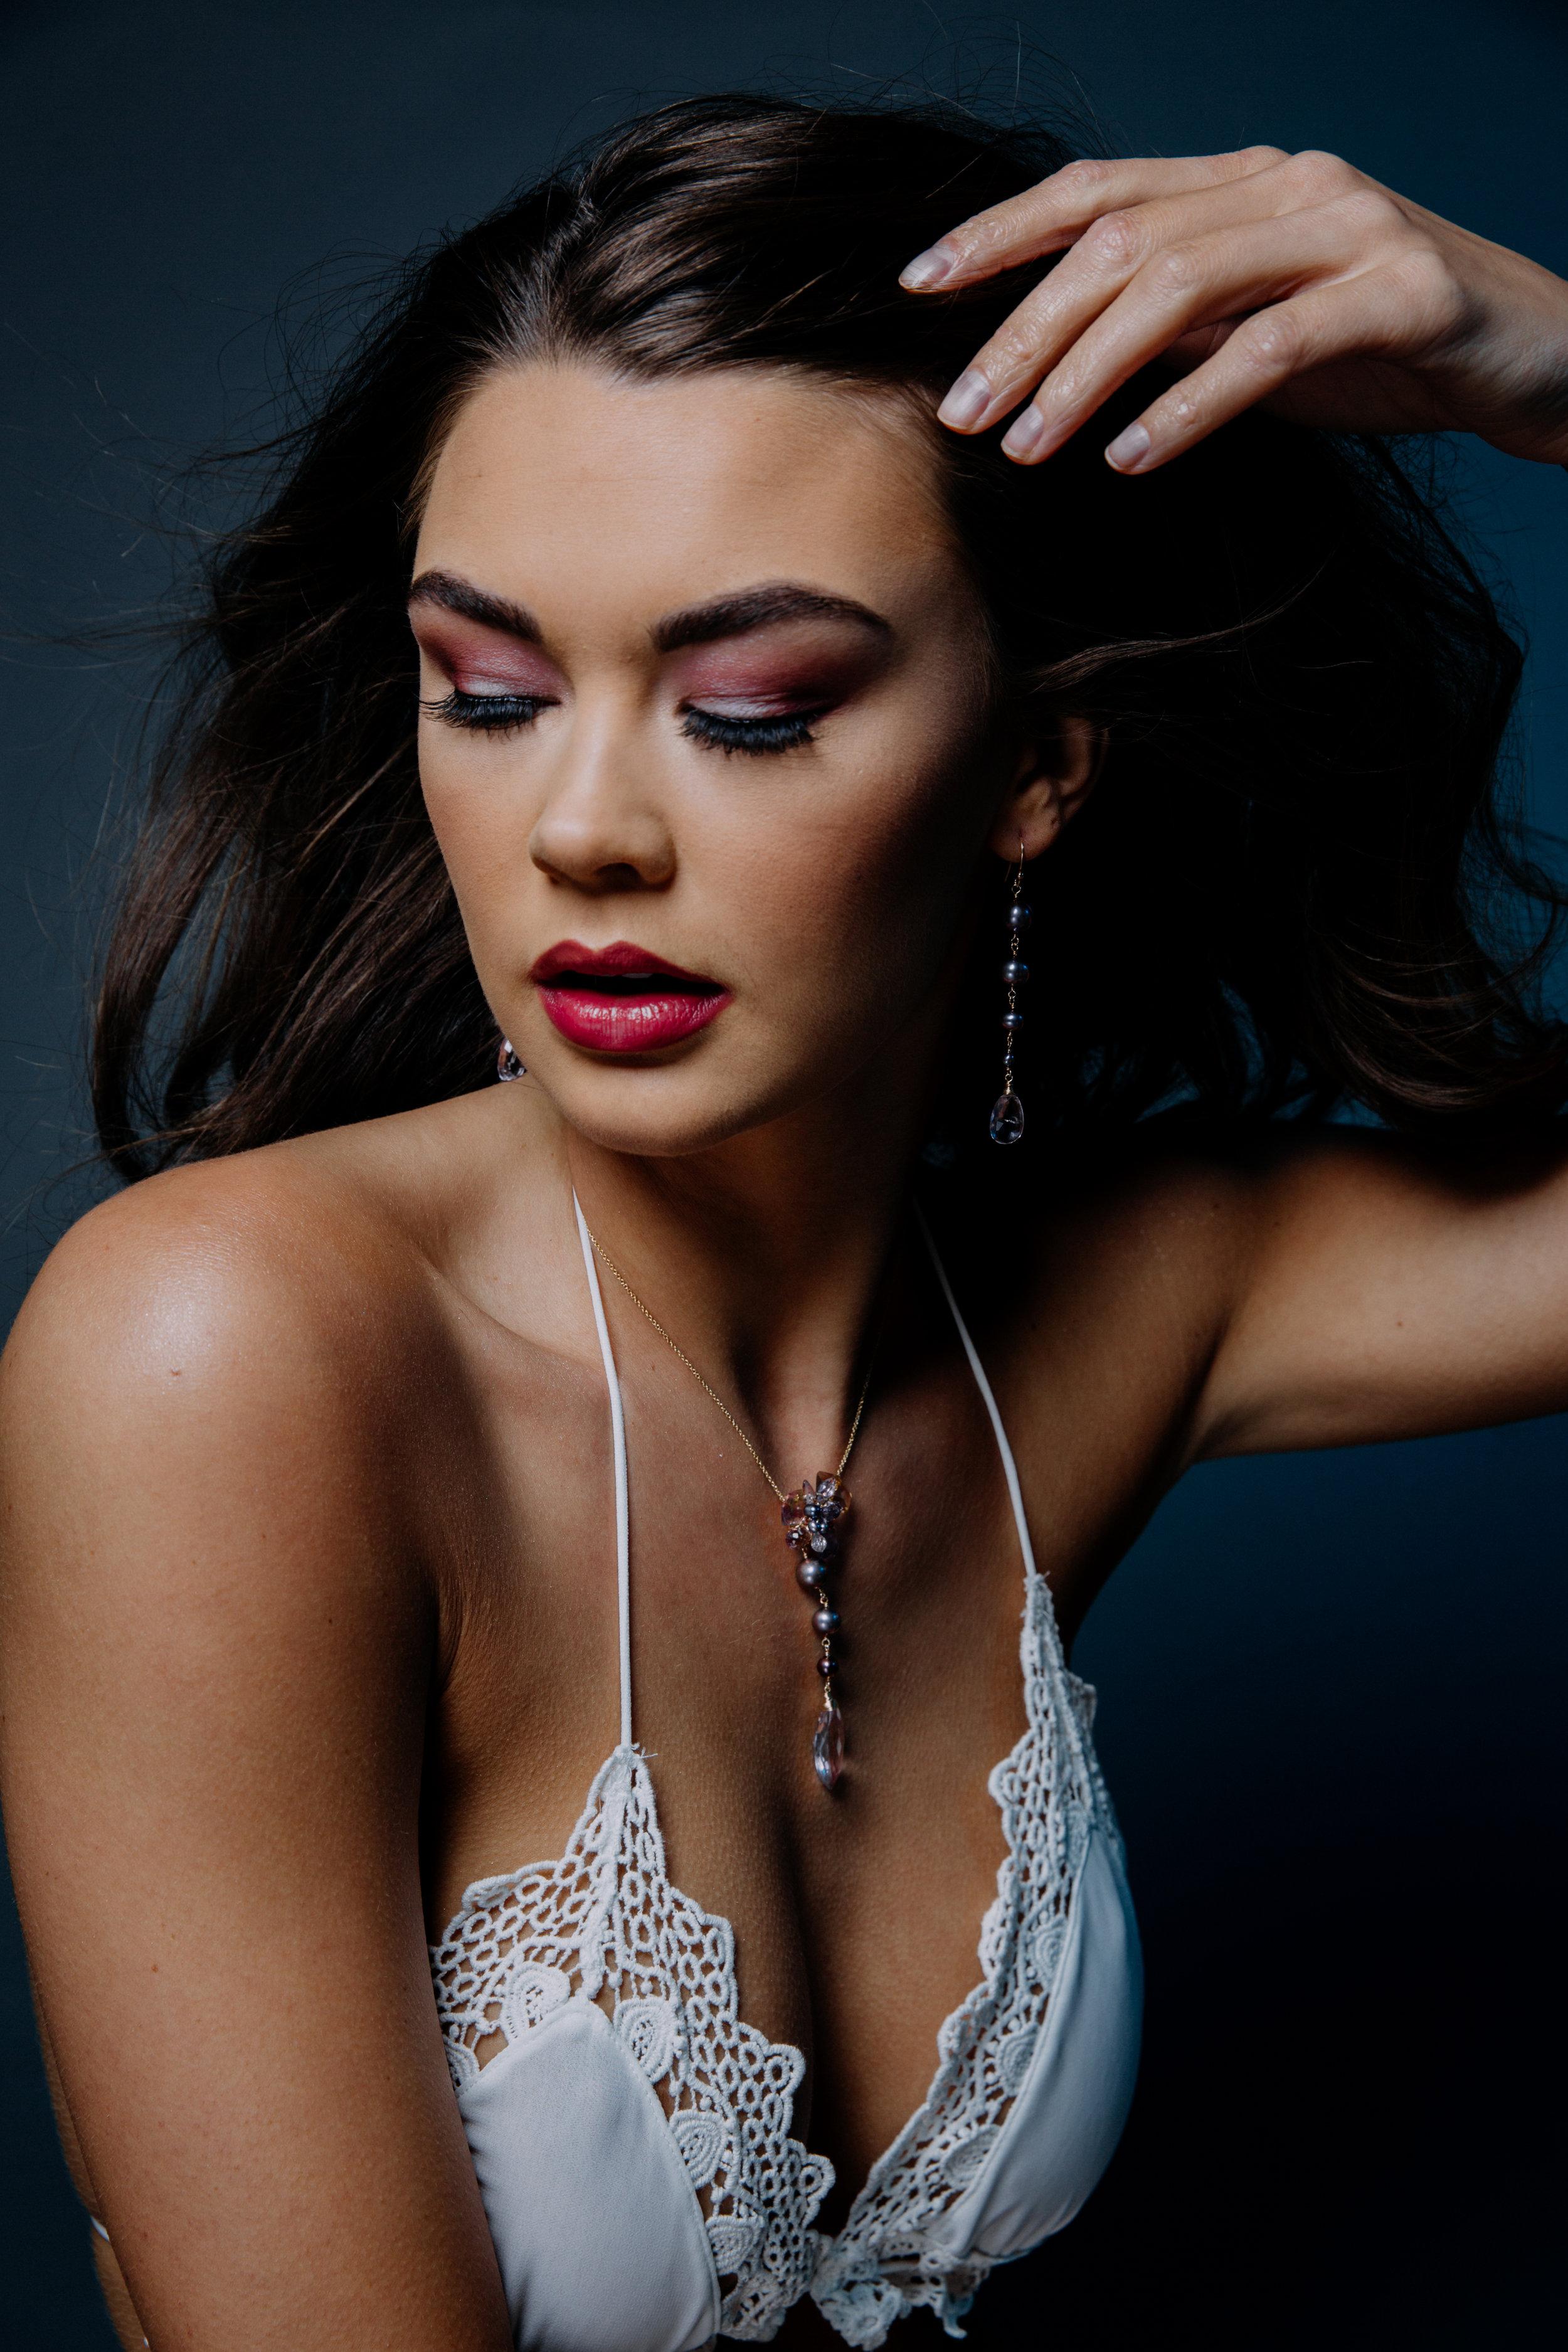 Model wearing pearl and pink amethyst drop earrings